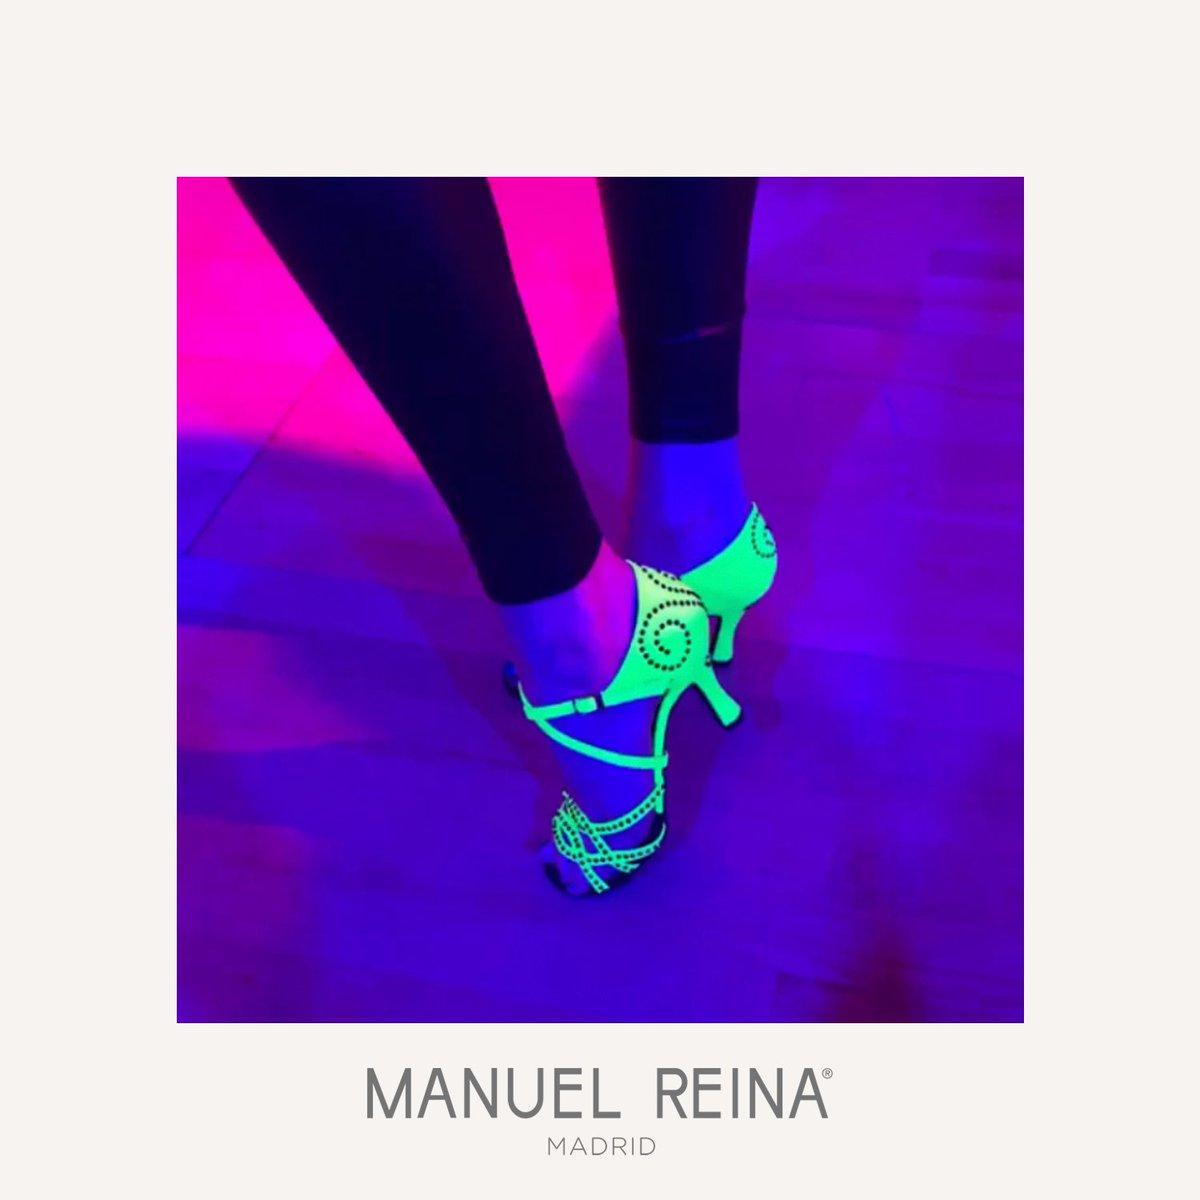 La noche es pura magia  . . . . . #dancing #ballet #dancers #edm #dj #rave #instadance #choreography #dancelife #housemusic #танцы #techno #dancemoms #ballerina #flexible #plur #house #dancemusic #dancefloor #flexibility #manuelreina #mnlrnshs #fluorpic.twitter.com/UwOnCXDJCM